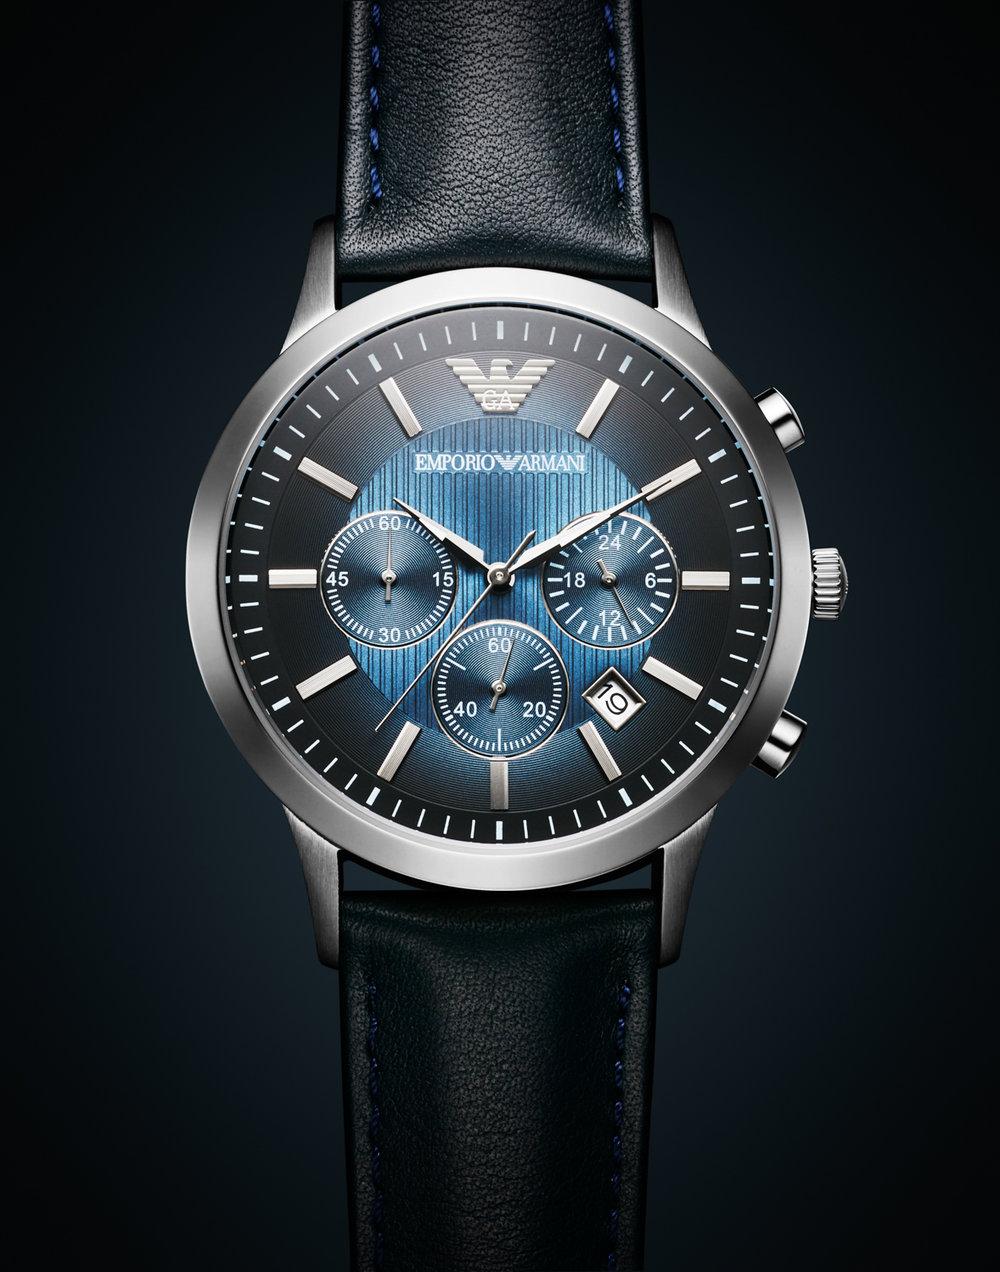 160319 Armani Watch B.jpg